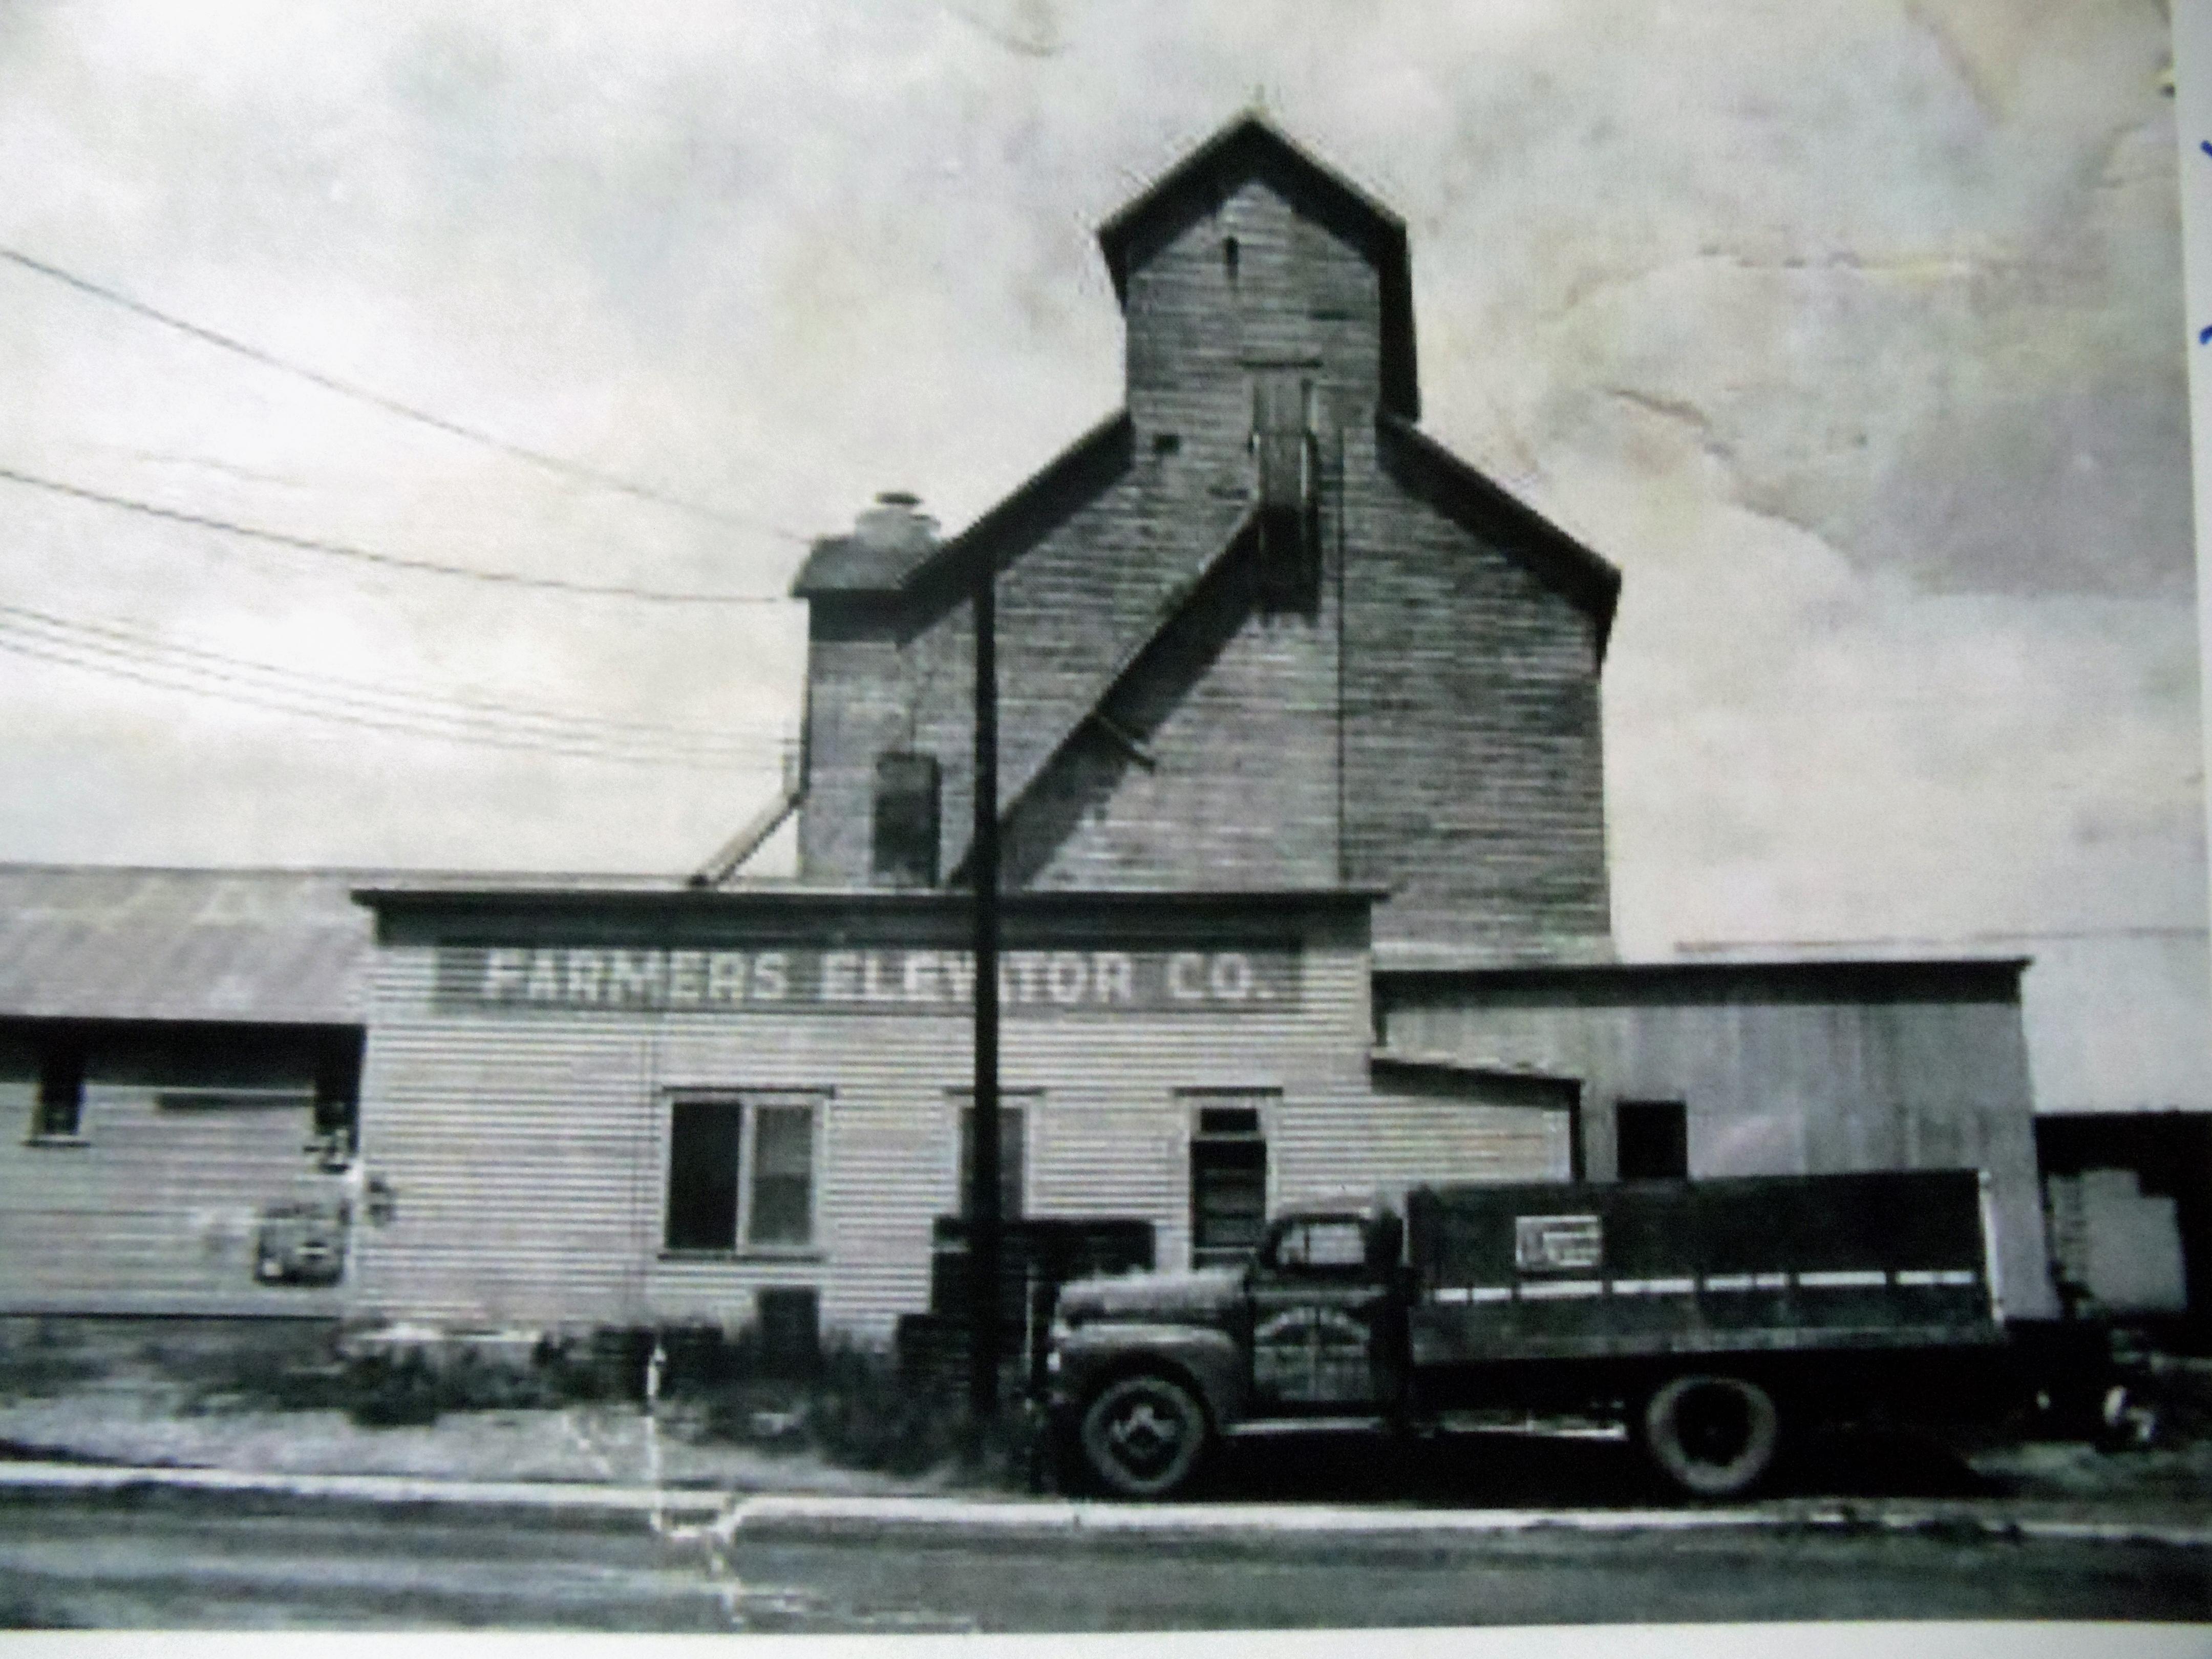 Farmers Elevator Co.